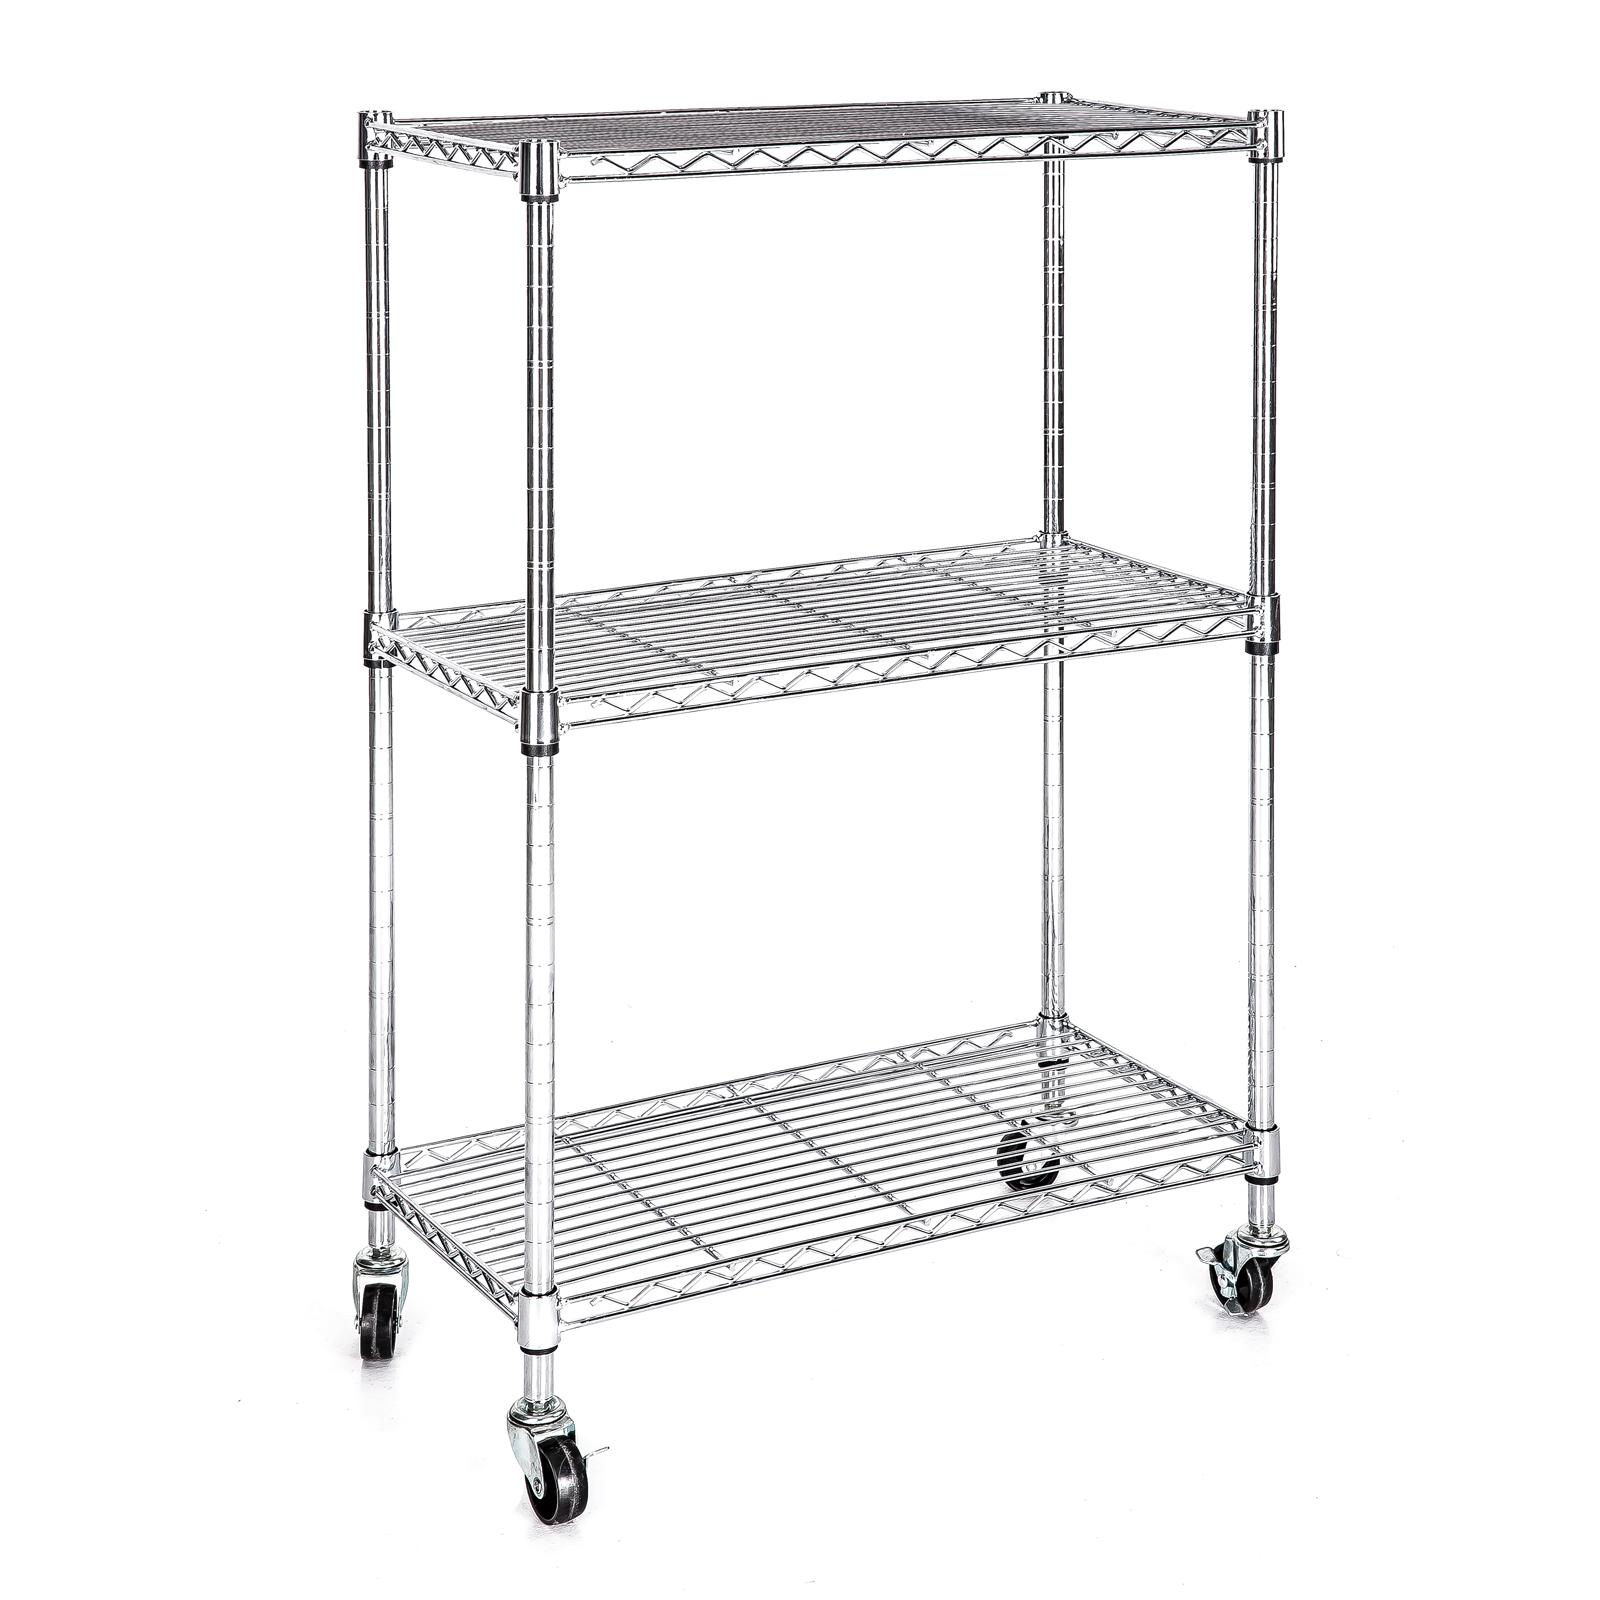 heavy duty chrome 3 tier wire shelving rack cart unit w. Black Bedroom Furniture Sets. Home Design Ideas